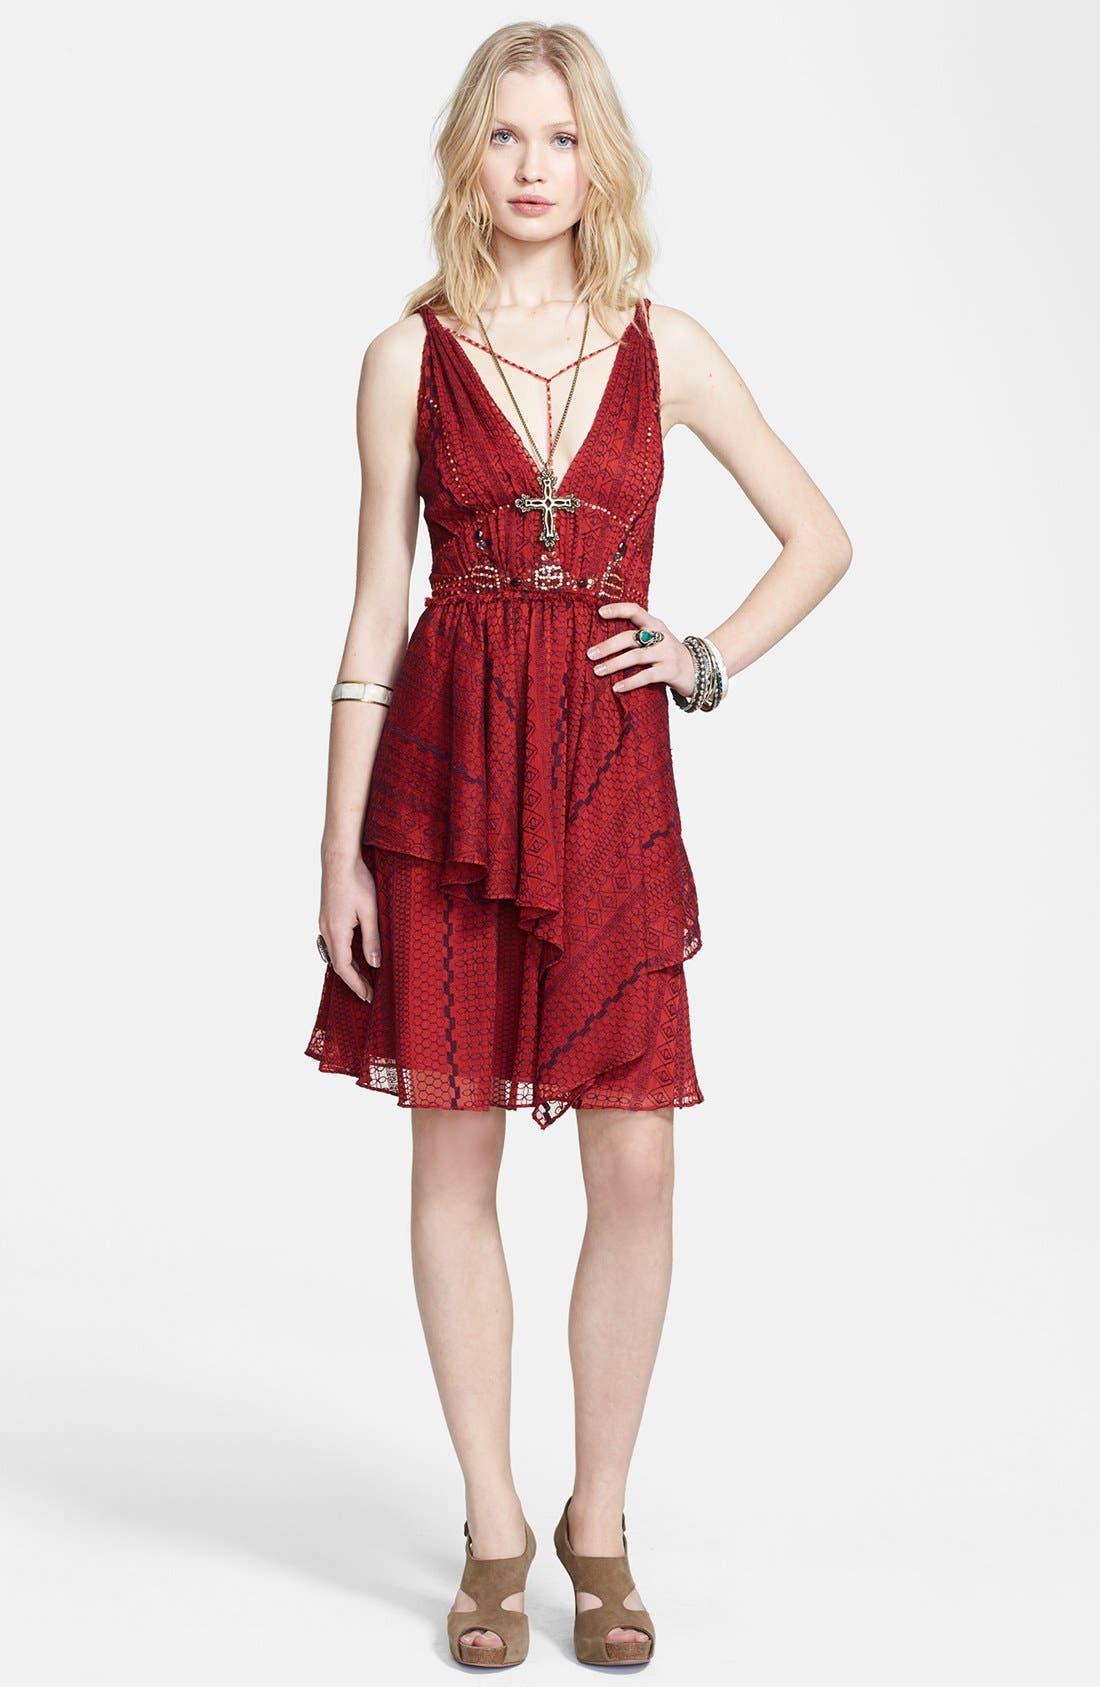 Main Image - Free People 'Leia' Embroidered Chiffon Fit & Flare Dress